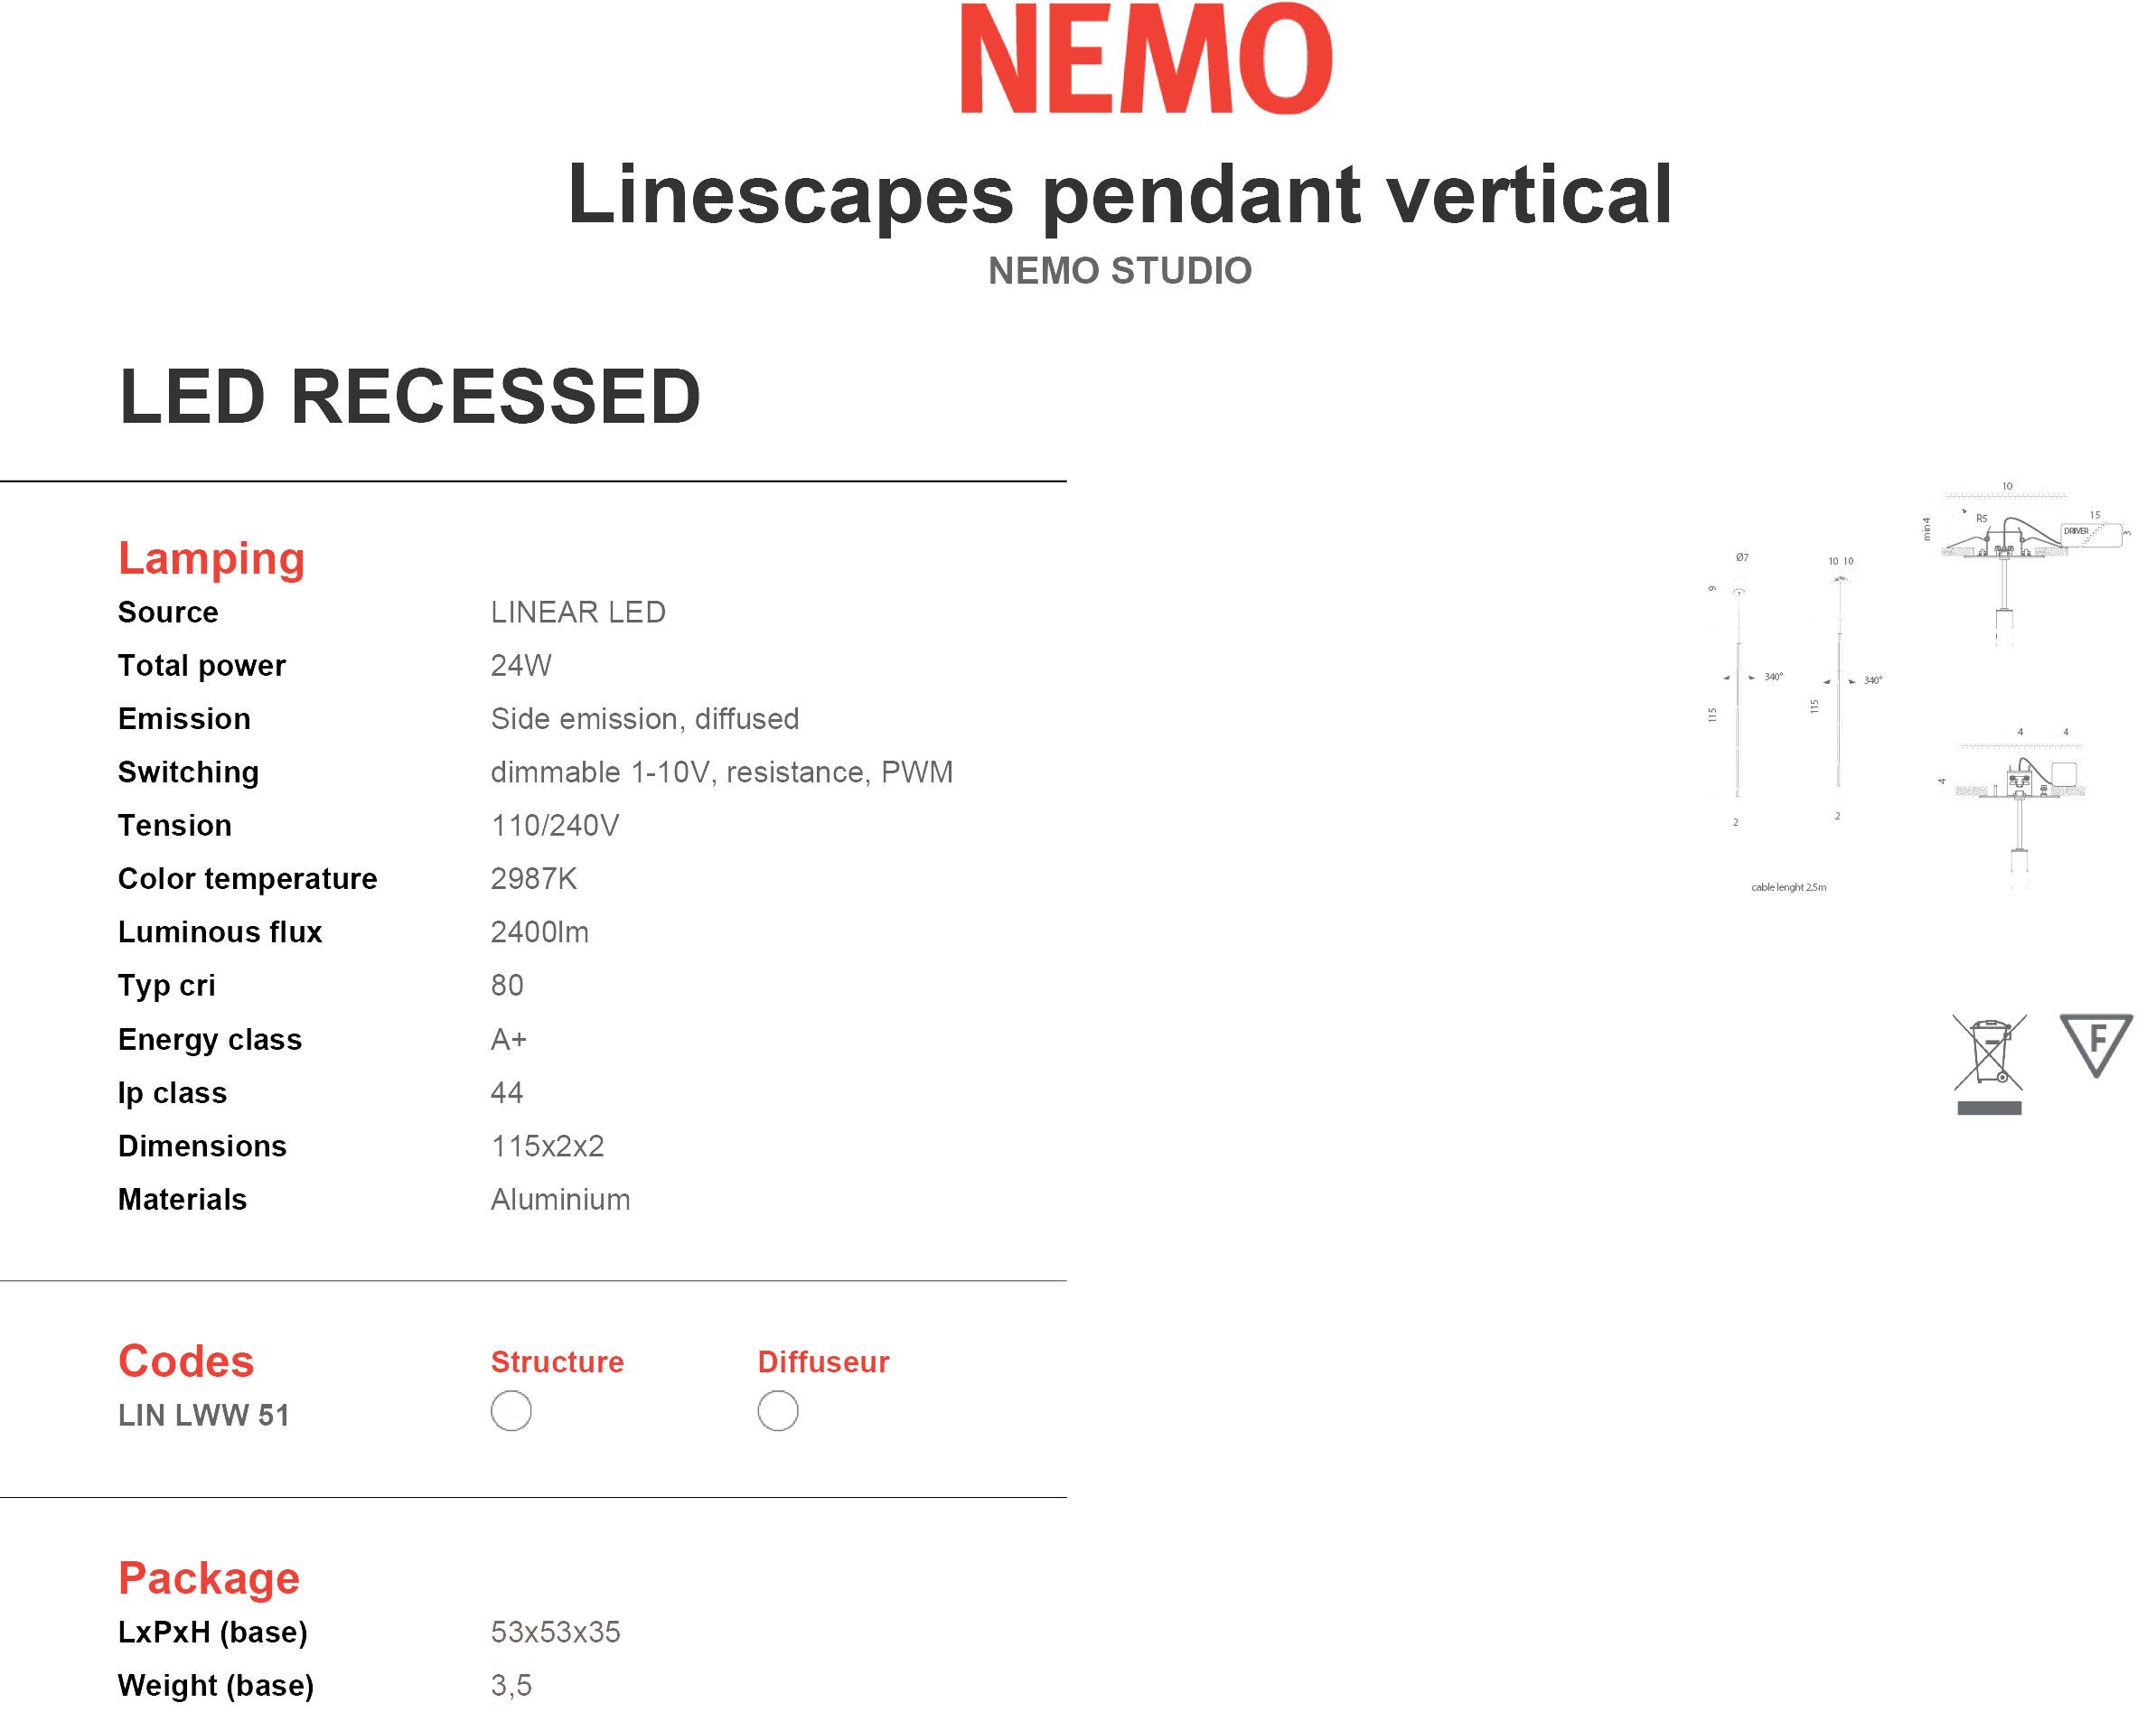 Nemo Linescapes Pendant Vertical Recessed Tech